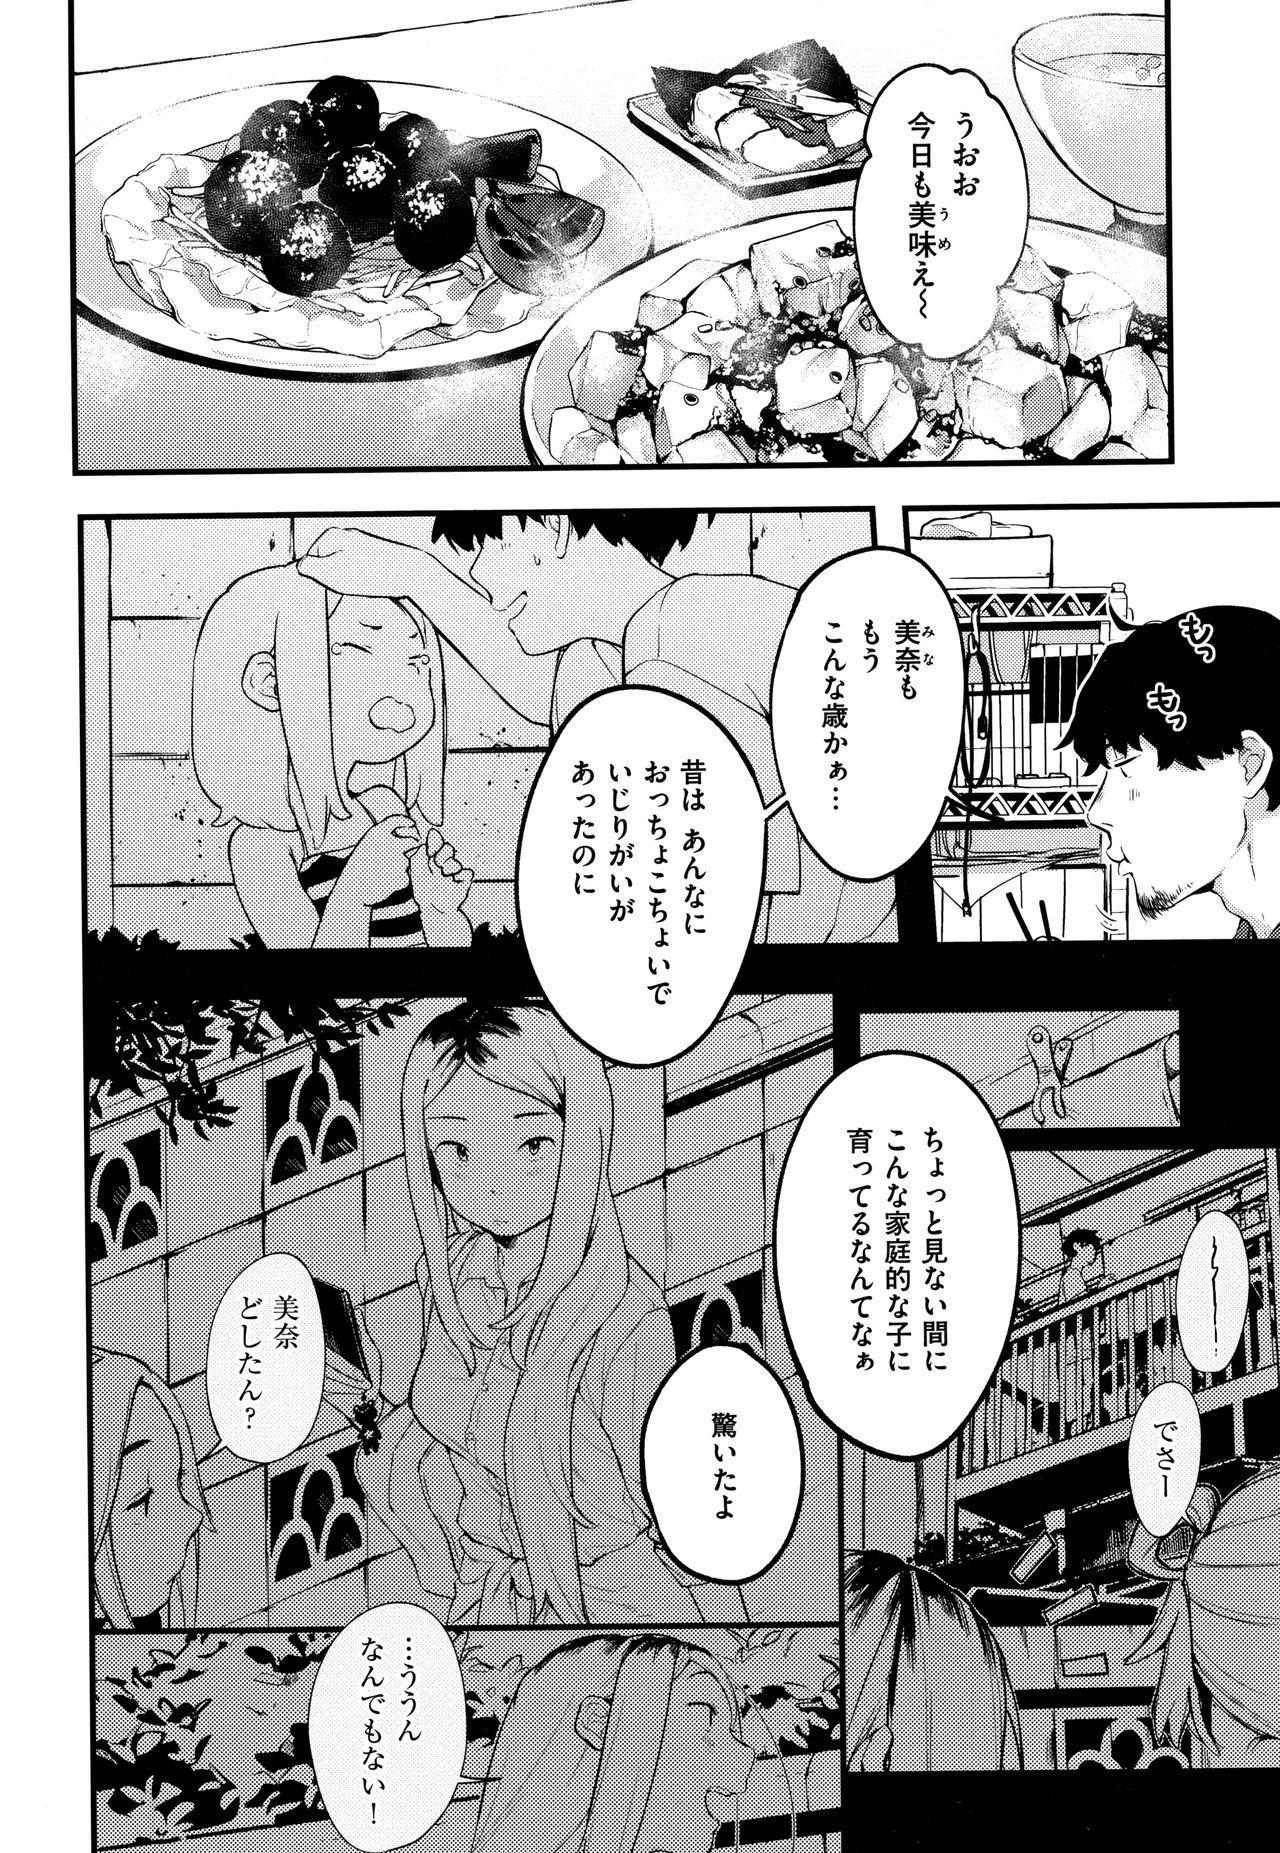 Haru to Ao - Our adolescence 12